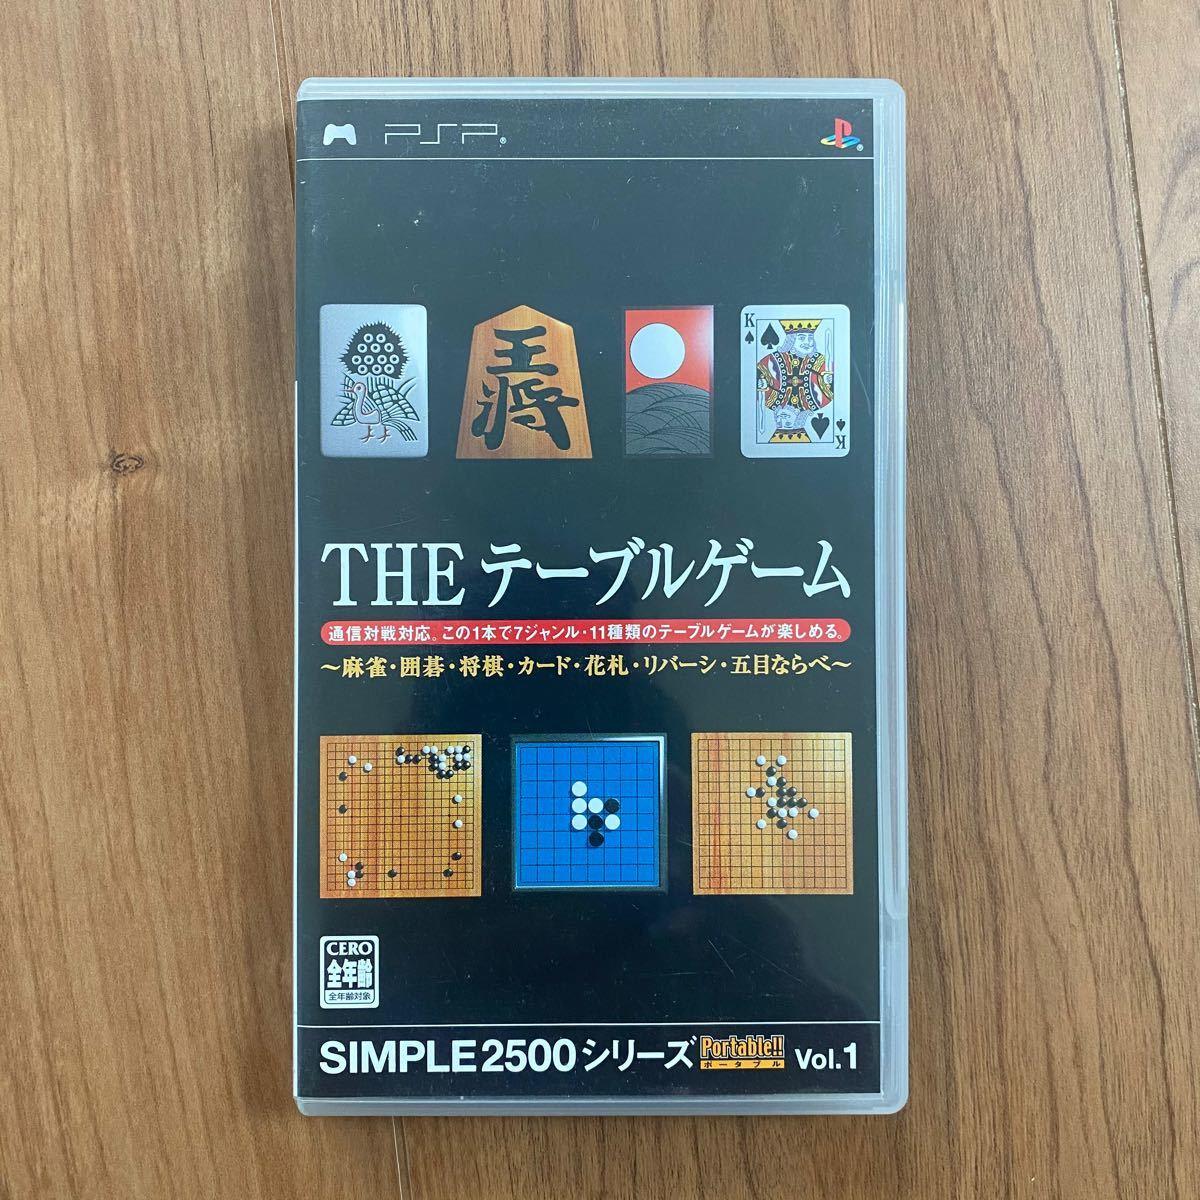 PSP THE テーブルゲーム 中古 SIMPLE2000 麻雀